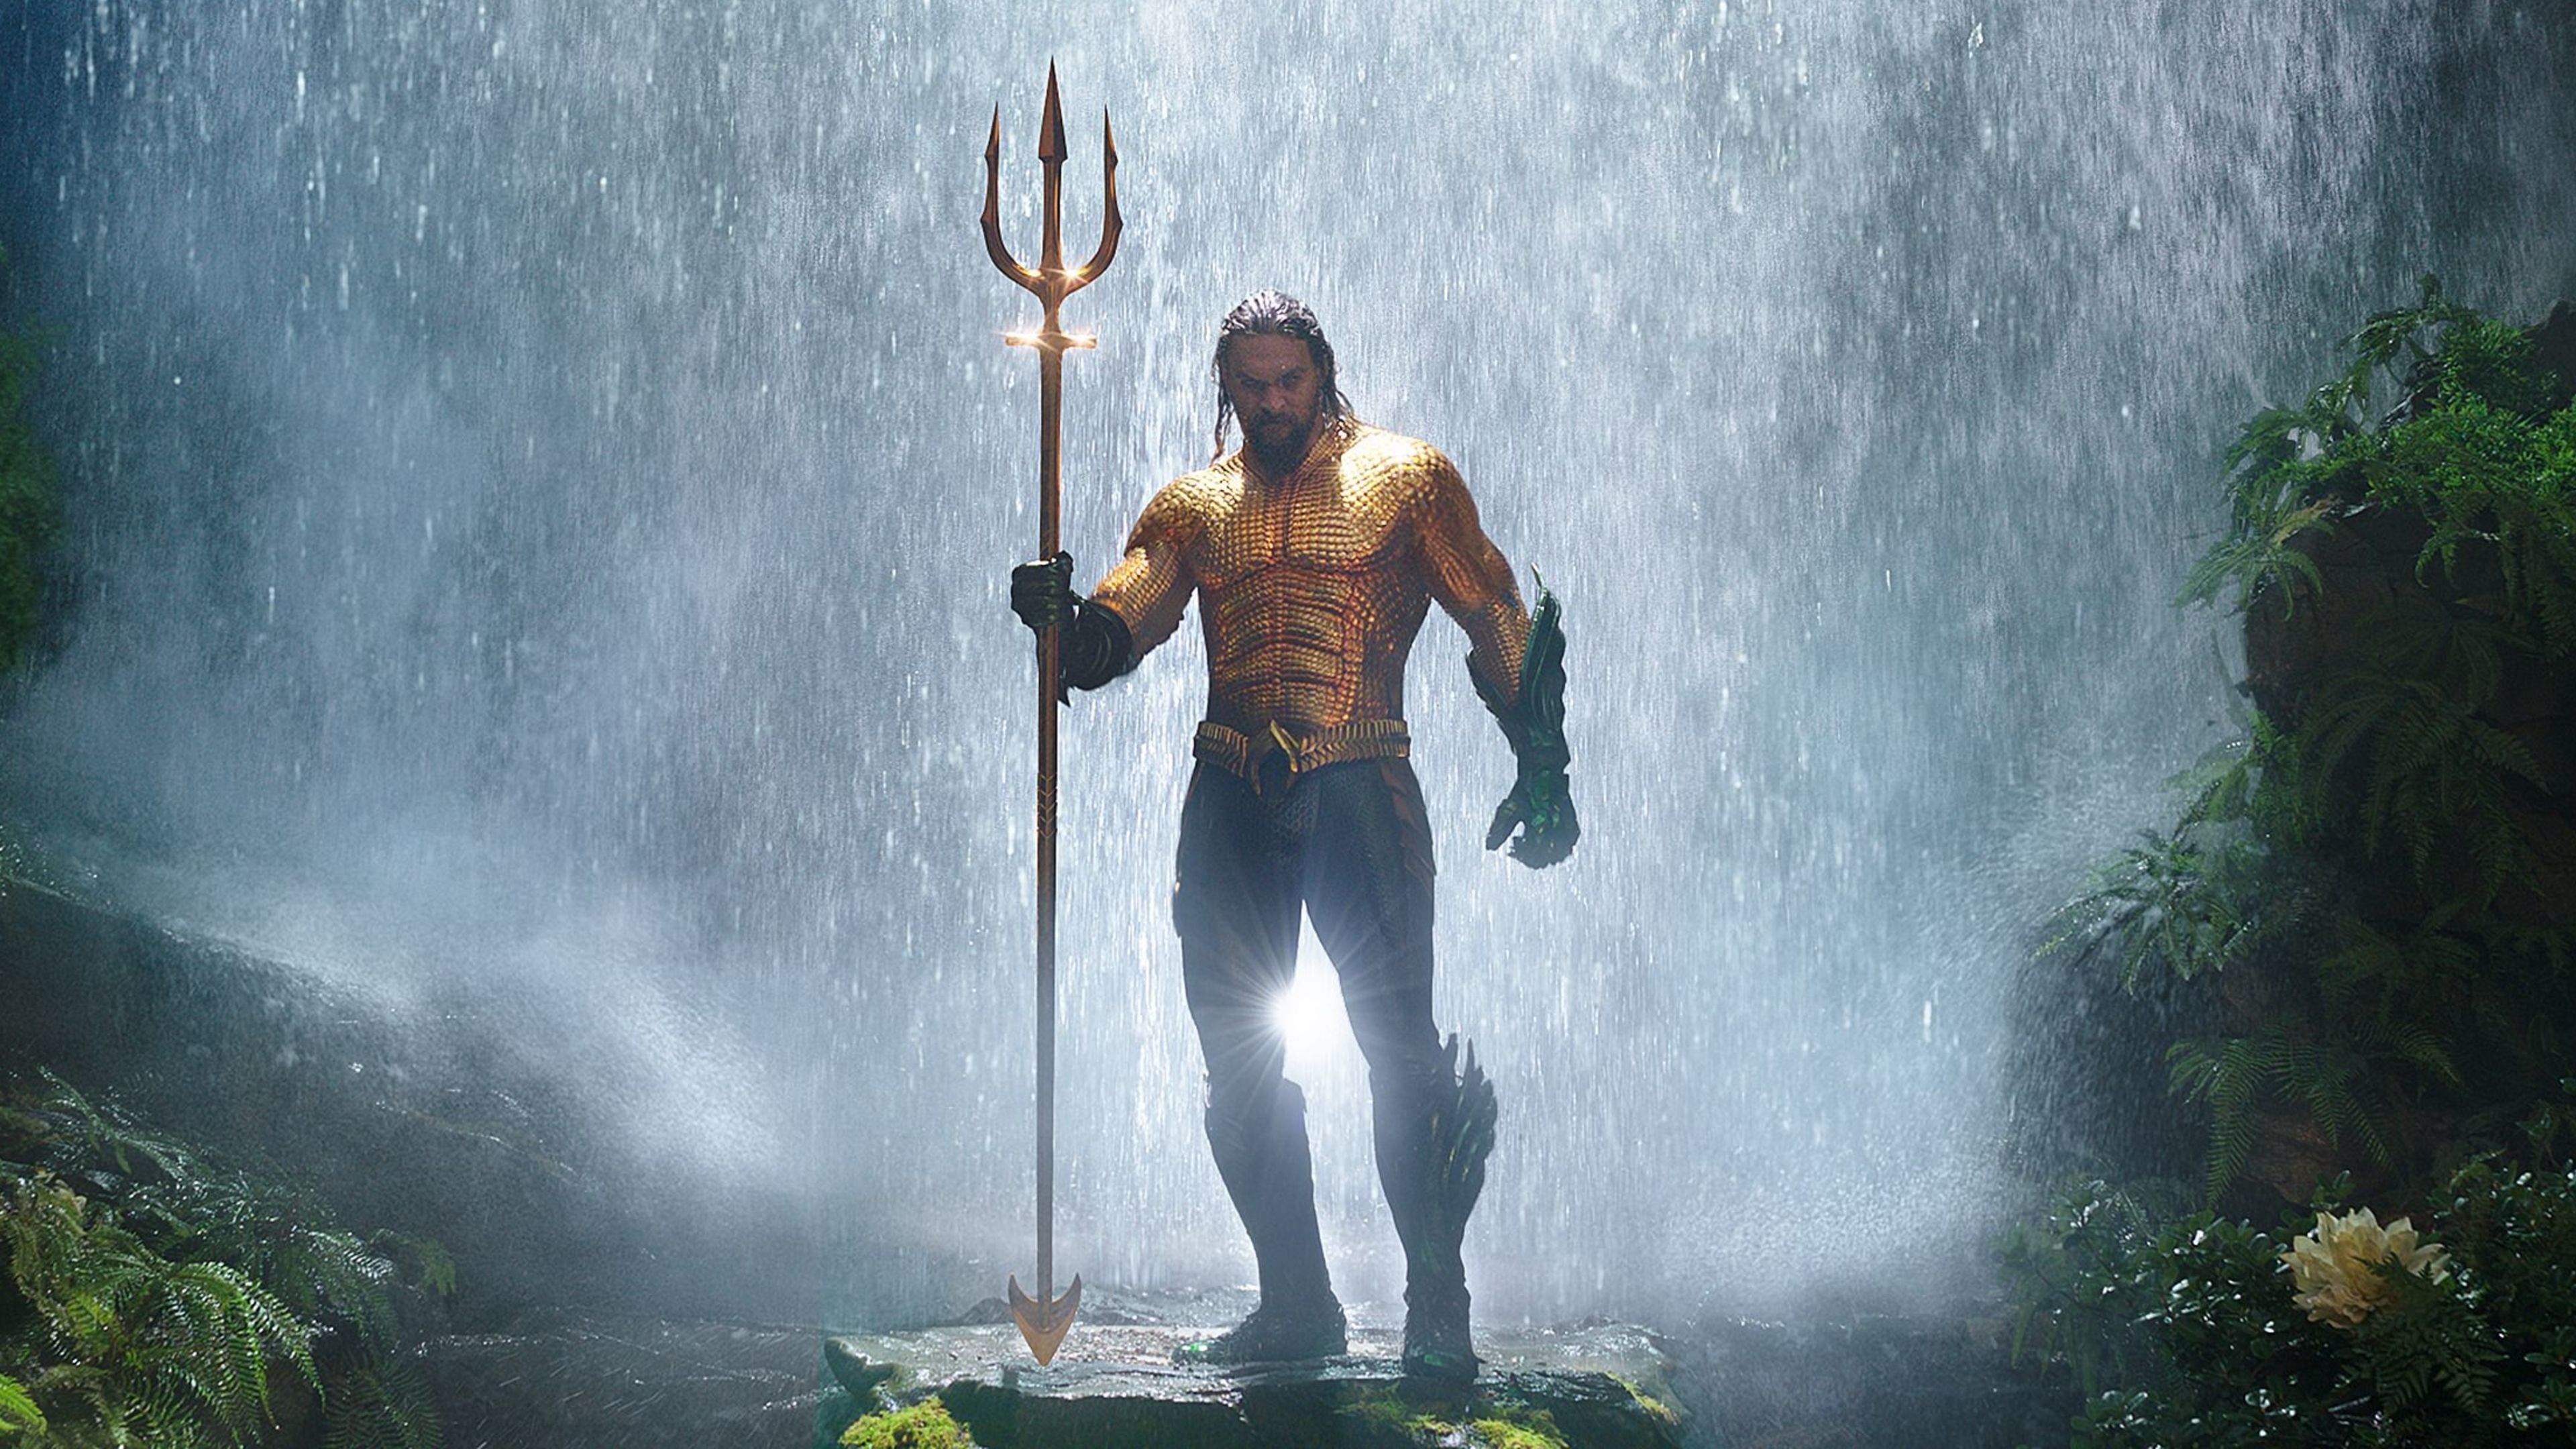 Aquaman 2018 Streaming Ita Cb01 Film Completo Italiano